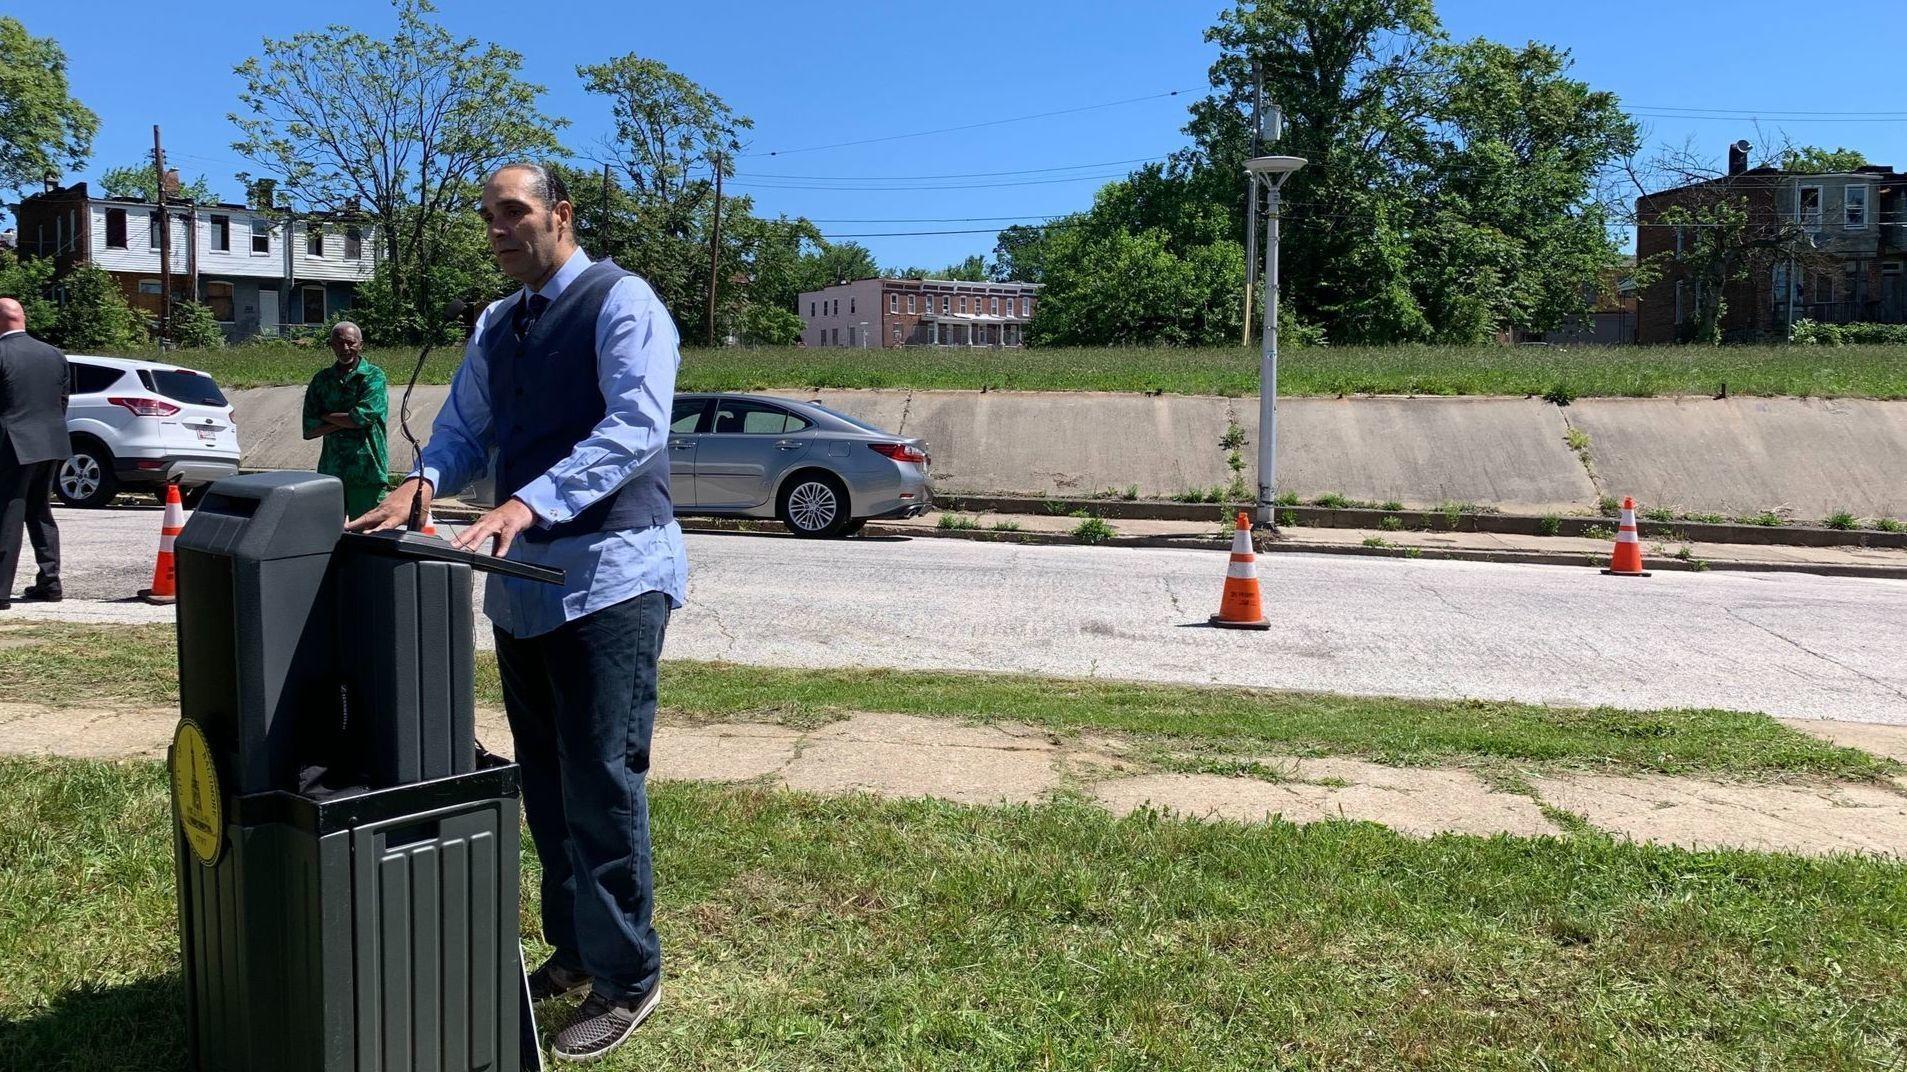 baltimoresun.com - Ian Duncan - City's vision for a Northeast Baltimore neighborhood: $250,000 solar-powered homes in an 'eco-village